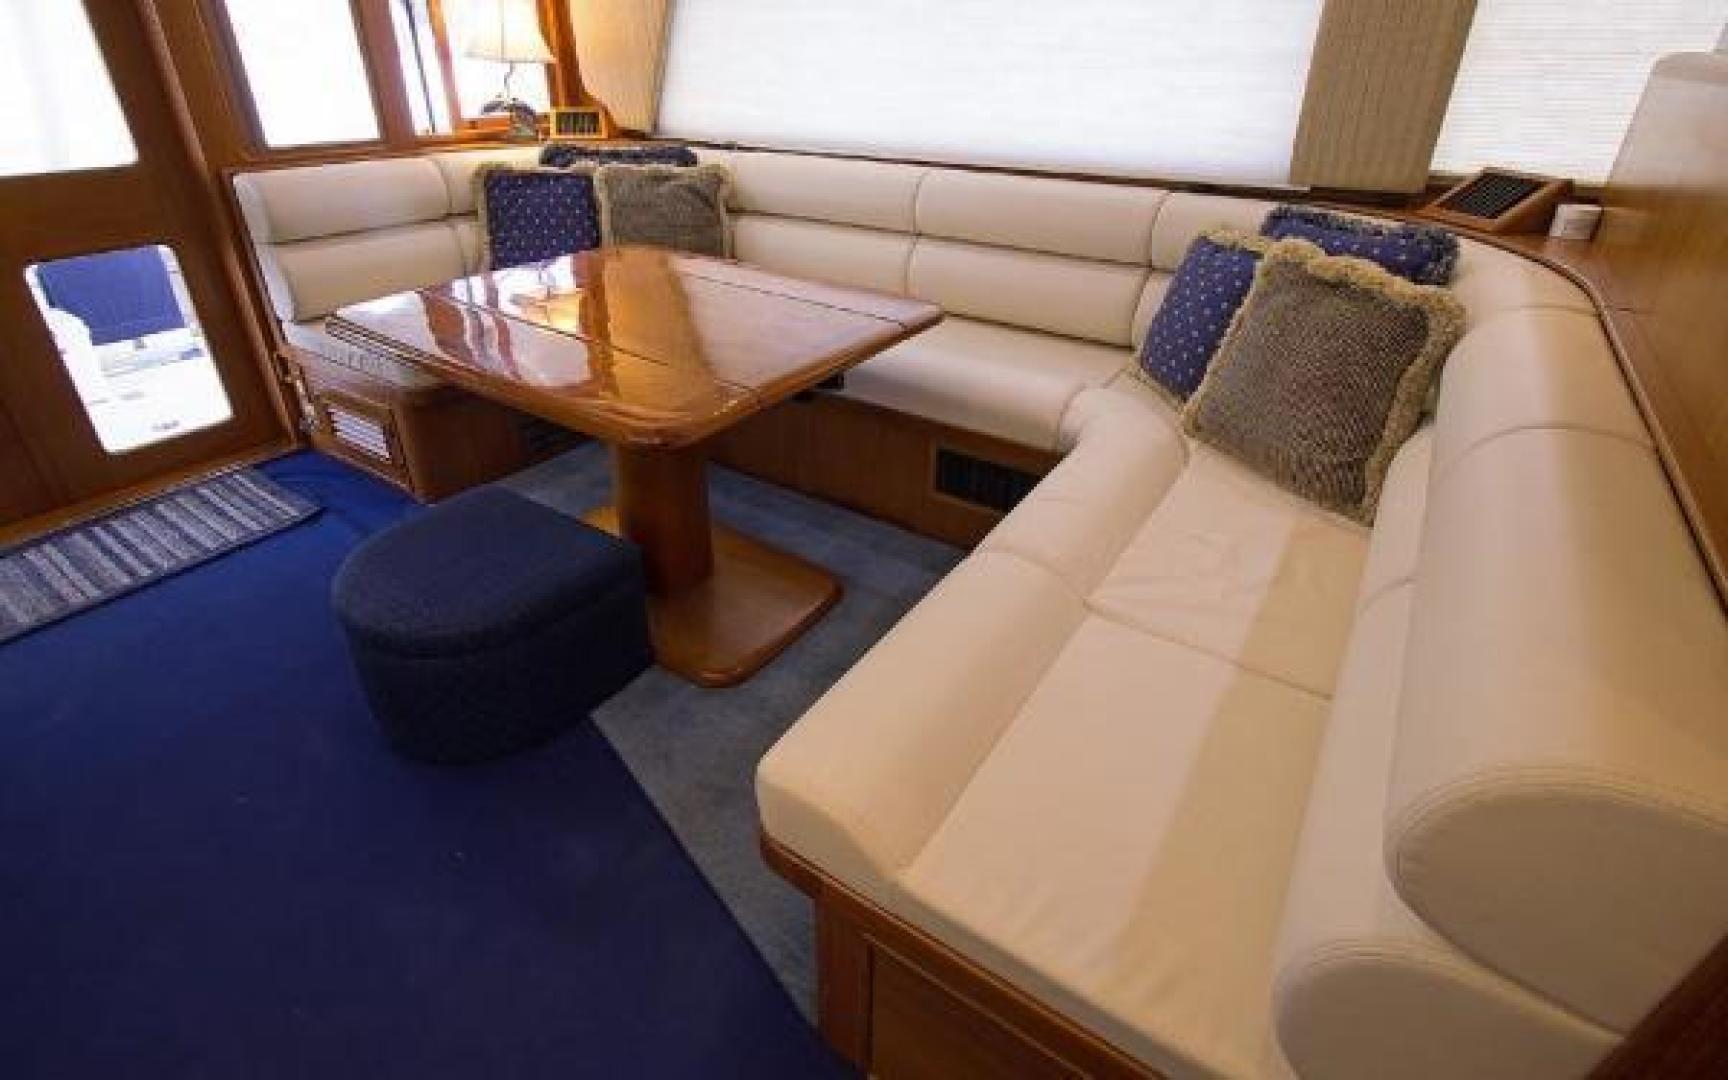 Offshore Yachts-62 Pilot House 2001-Sandman II Fort Lauderdale-Florida-United States-1367885   Thumbnail